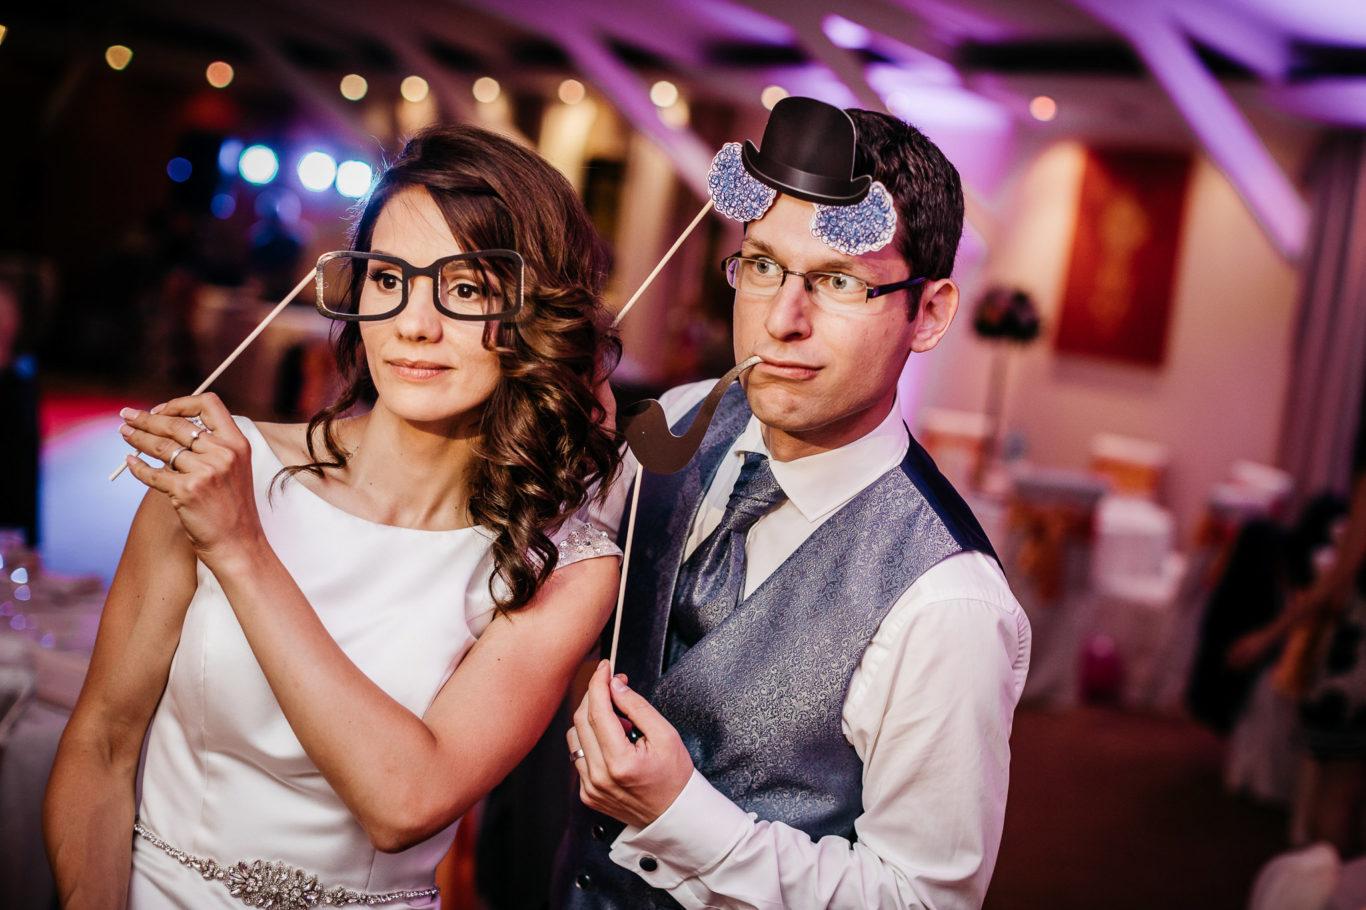 0732-fotografie-nunta-bucuresti-dana-radu-fotograf-ciprian-dumitrescu-cd2_8141